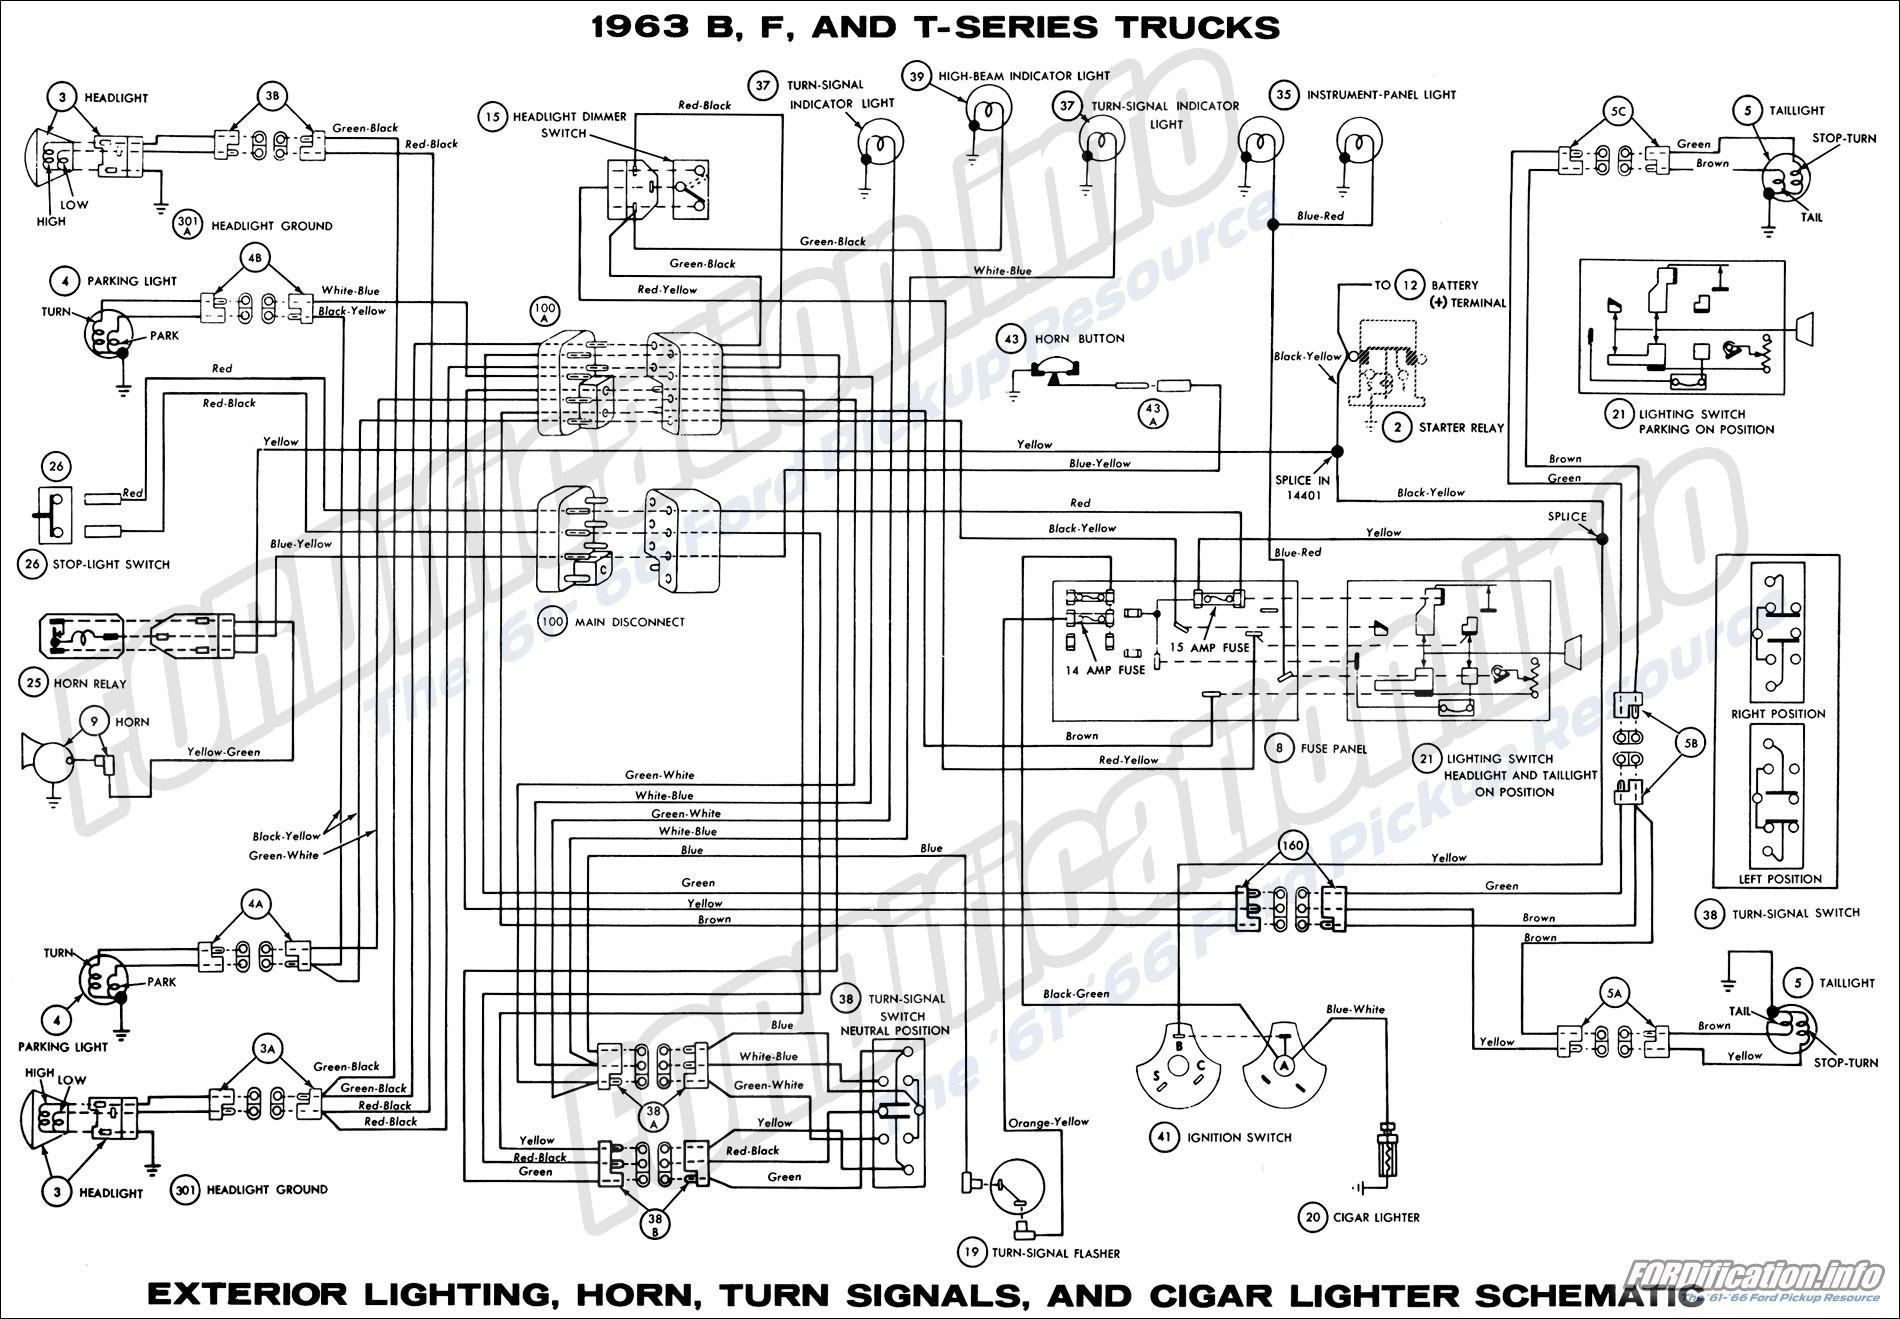 ford truck wiring diagrams free diagram chevrolet nova 79 turn signal